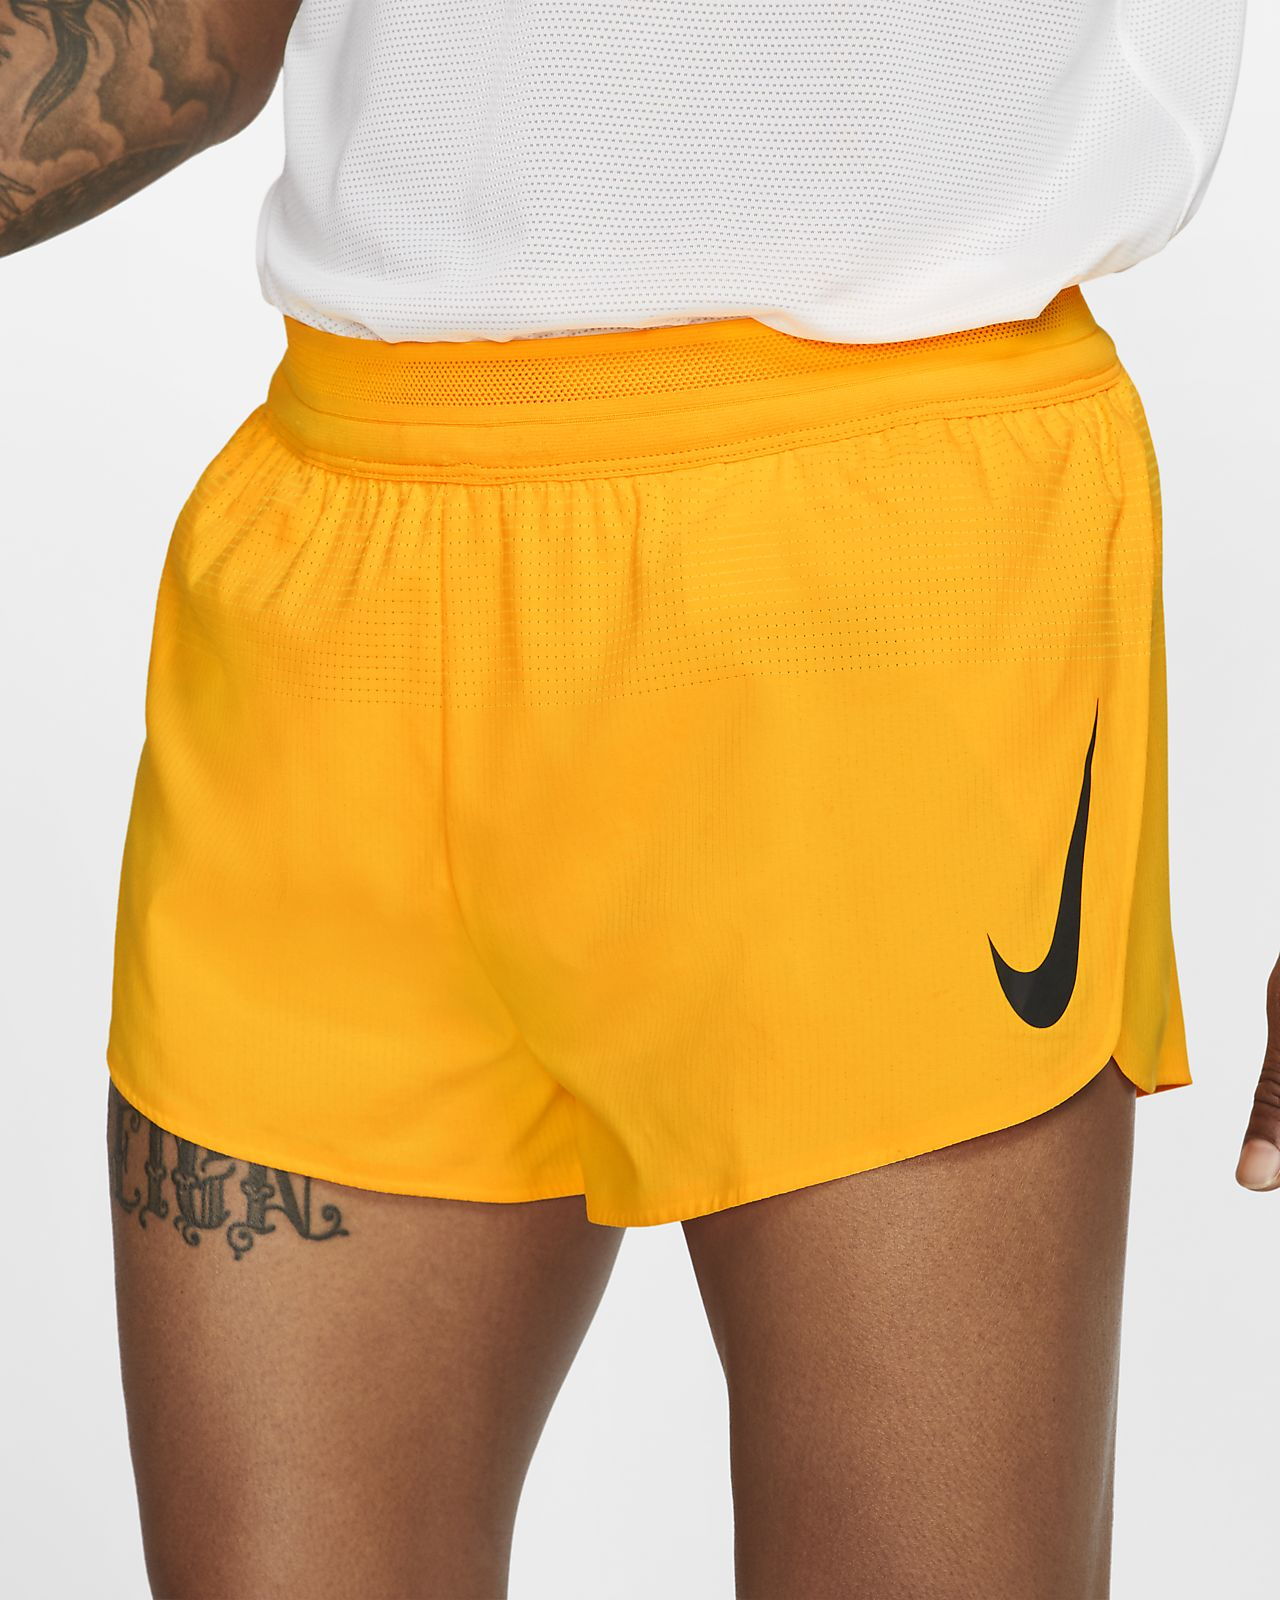 Pánské běžecké kraťasy Nike AeroSwift (London) (nohavička 5 cm)